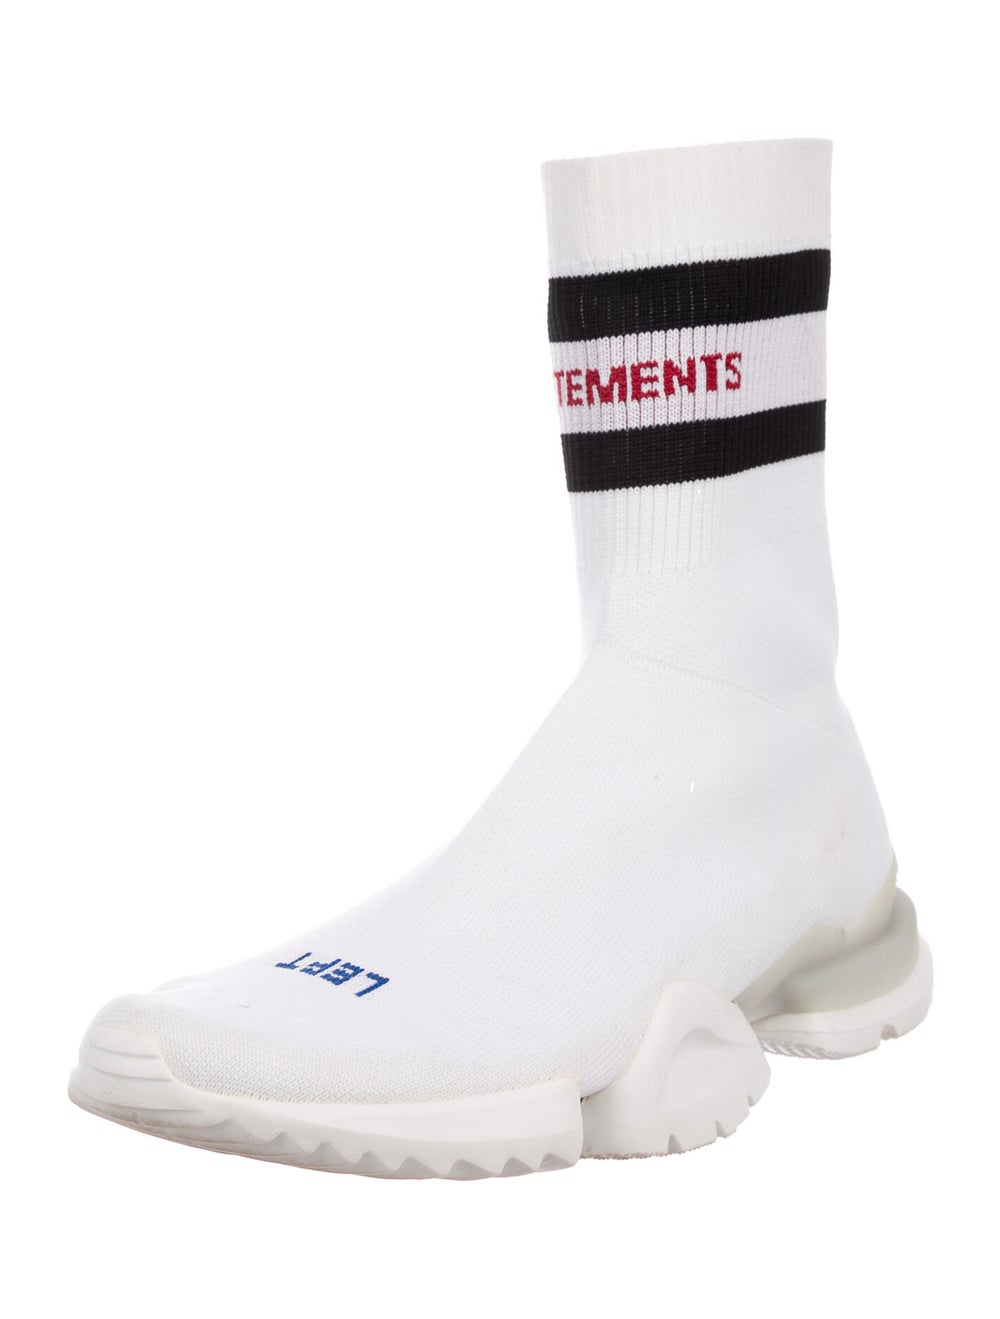 Vetements x Reebok Sock Pump High-Top Sock Sneake… - image 2